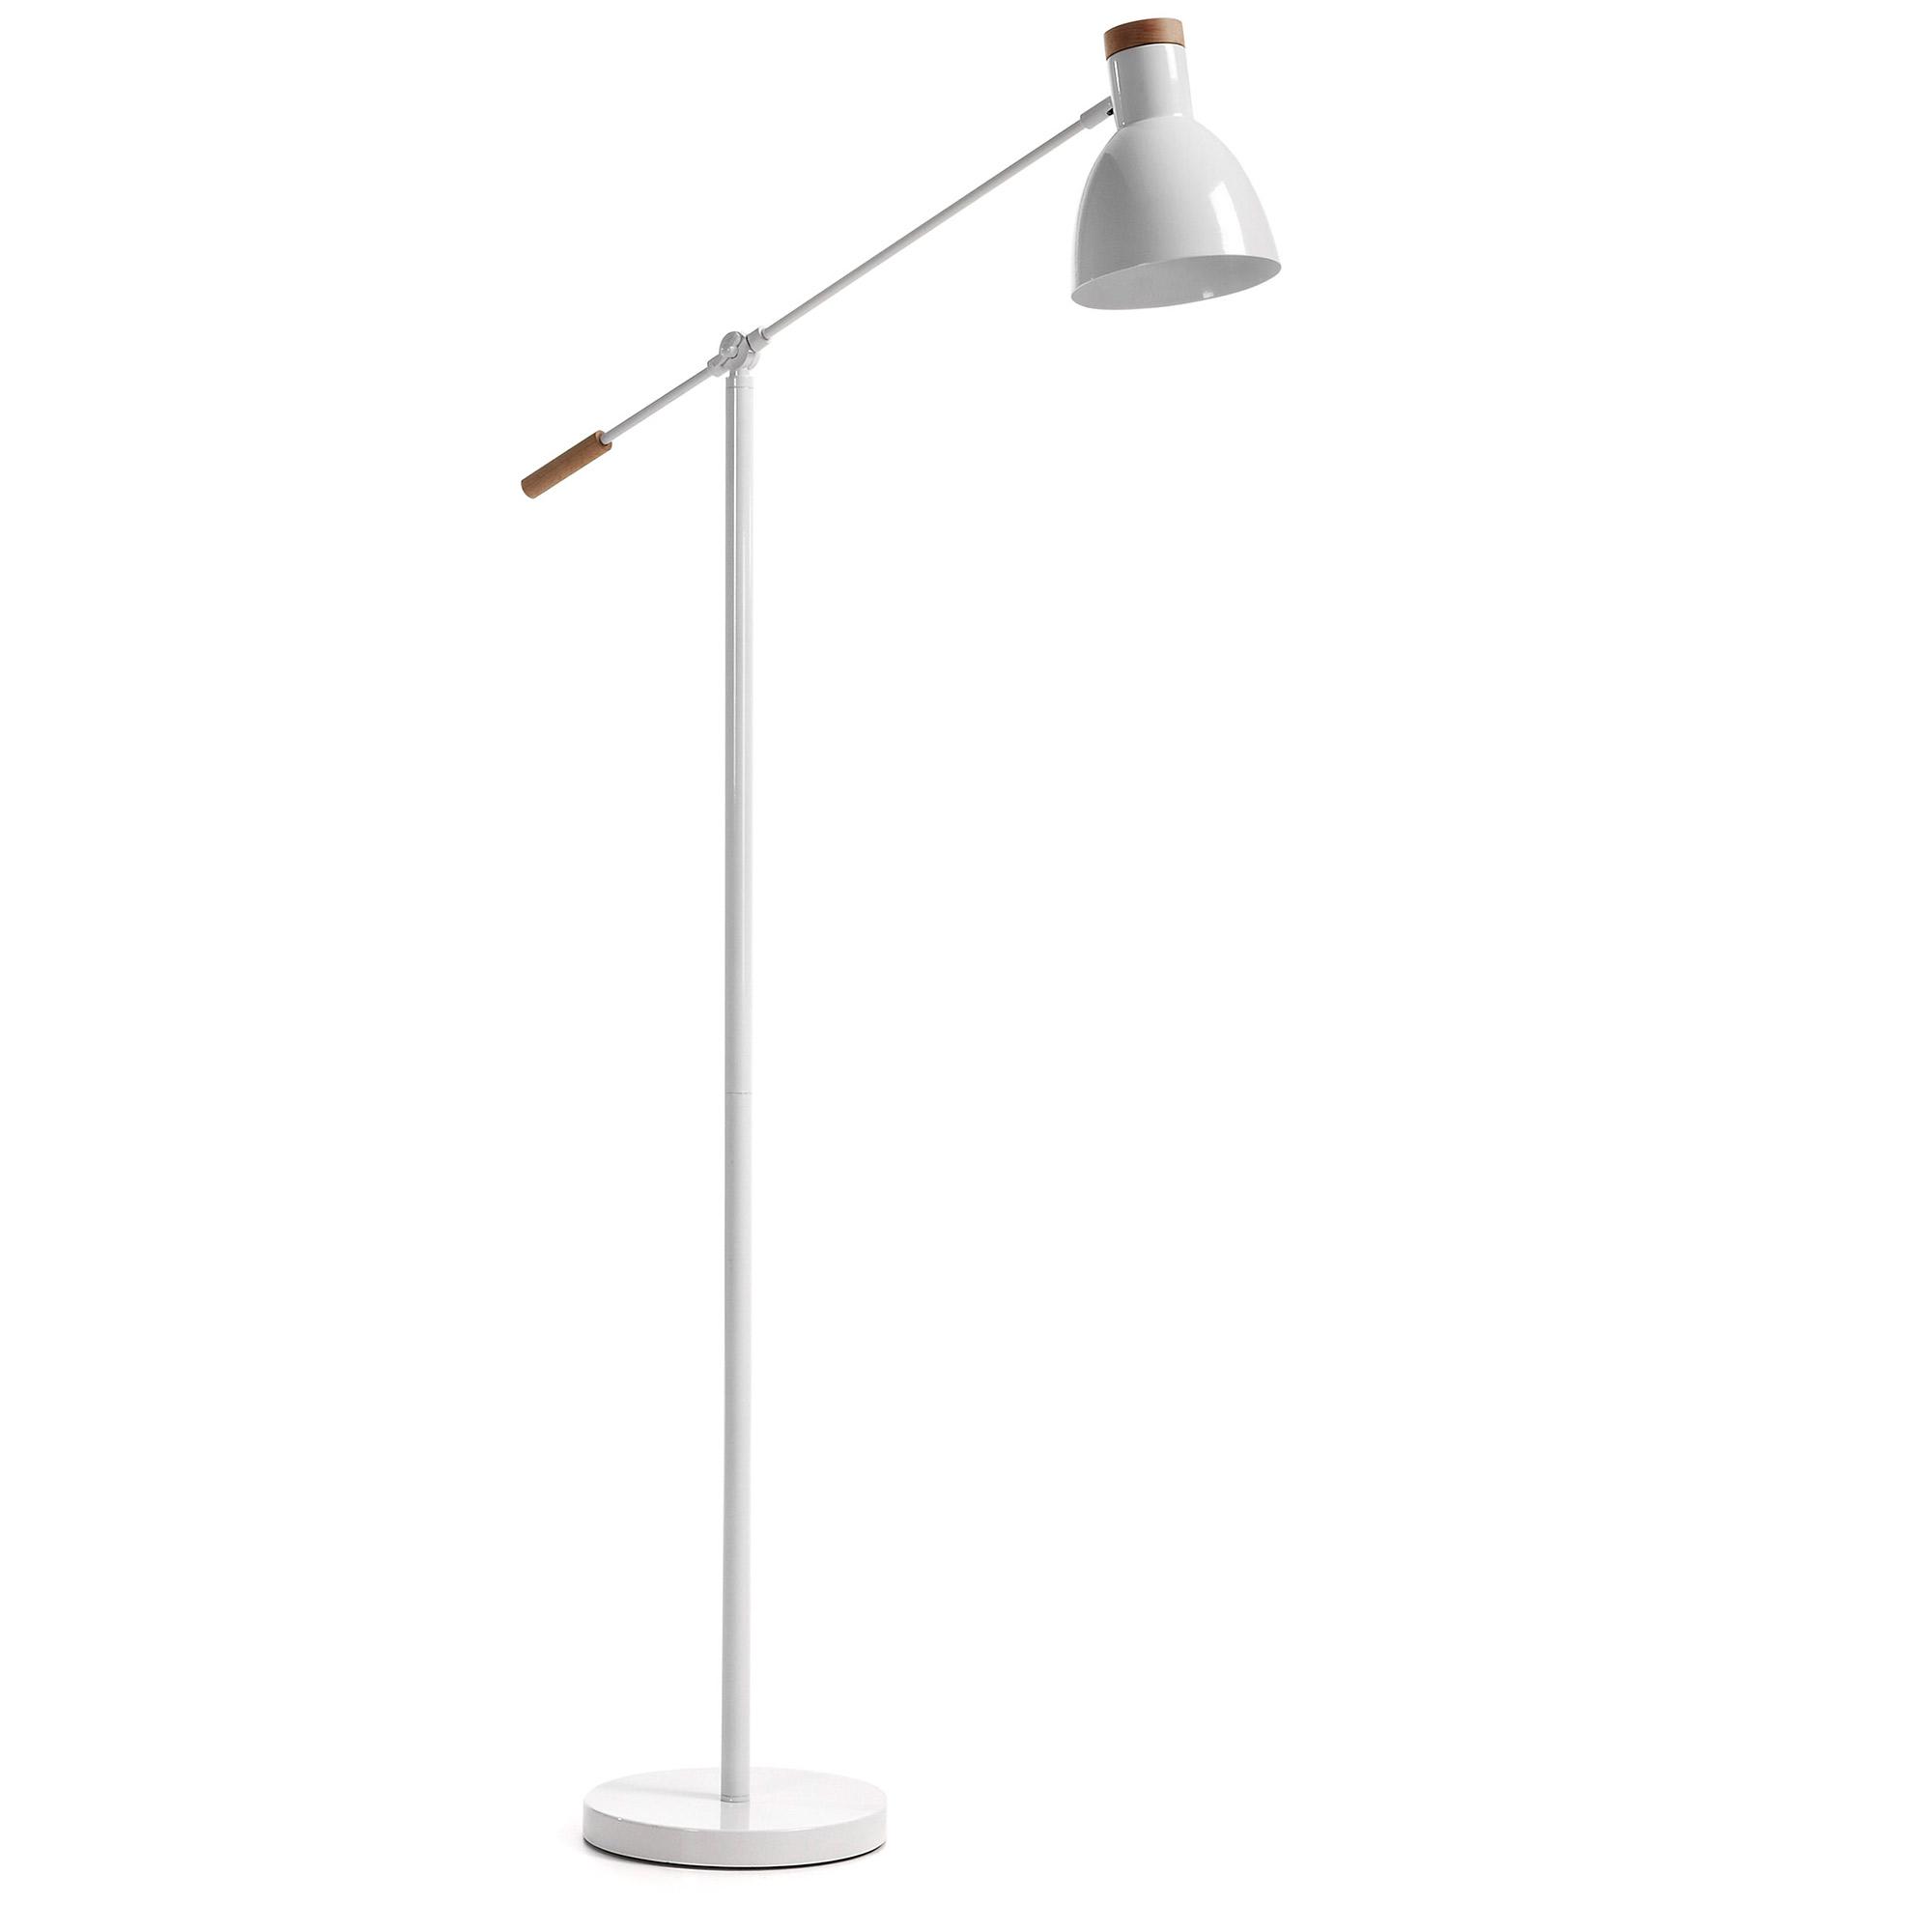 Laforma scarlett gulvlampe - hvid/natur metal/træ fra laforma fra boboonline.dk